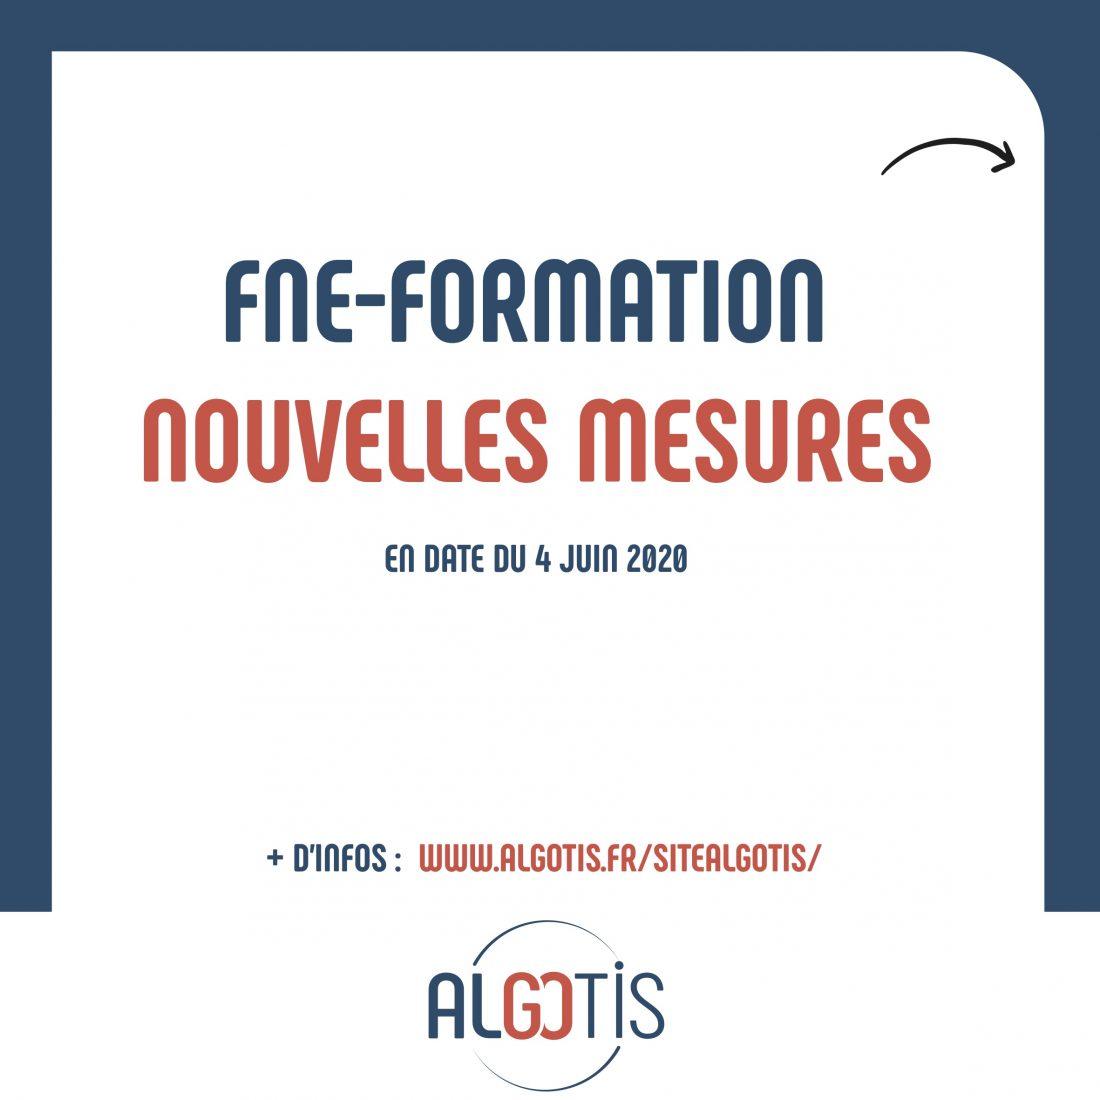 fne-formation-algotis